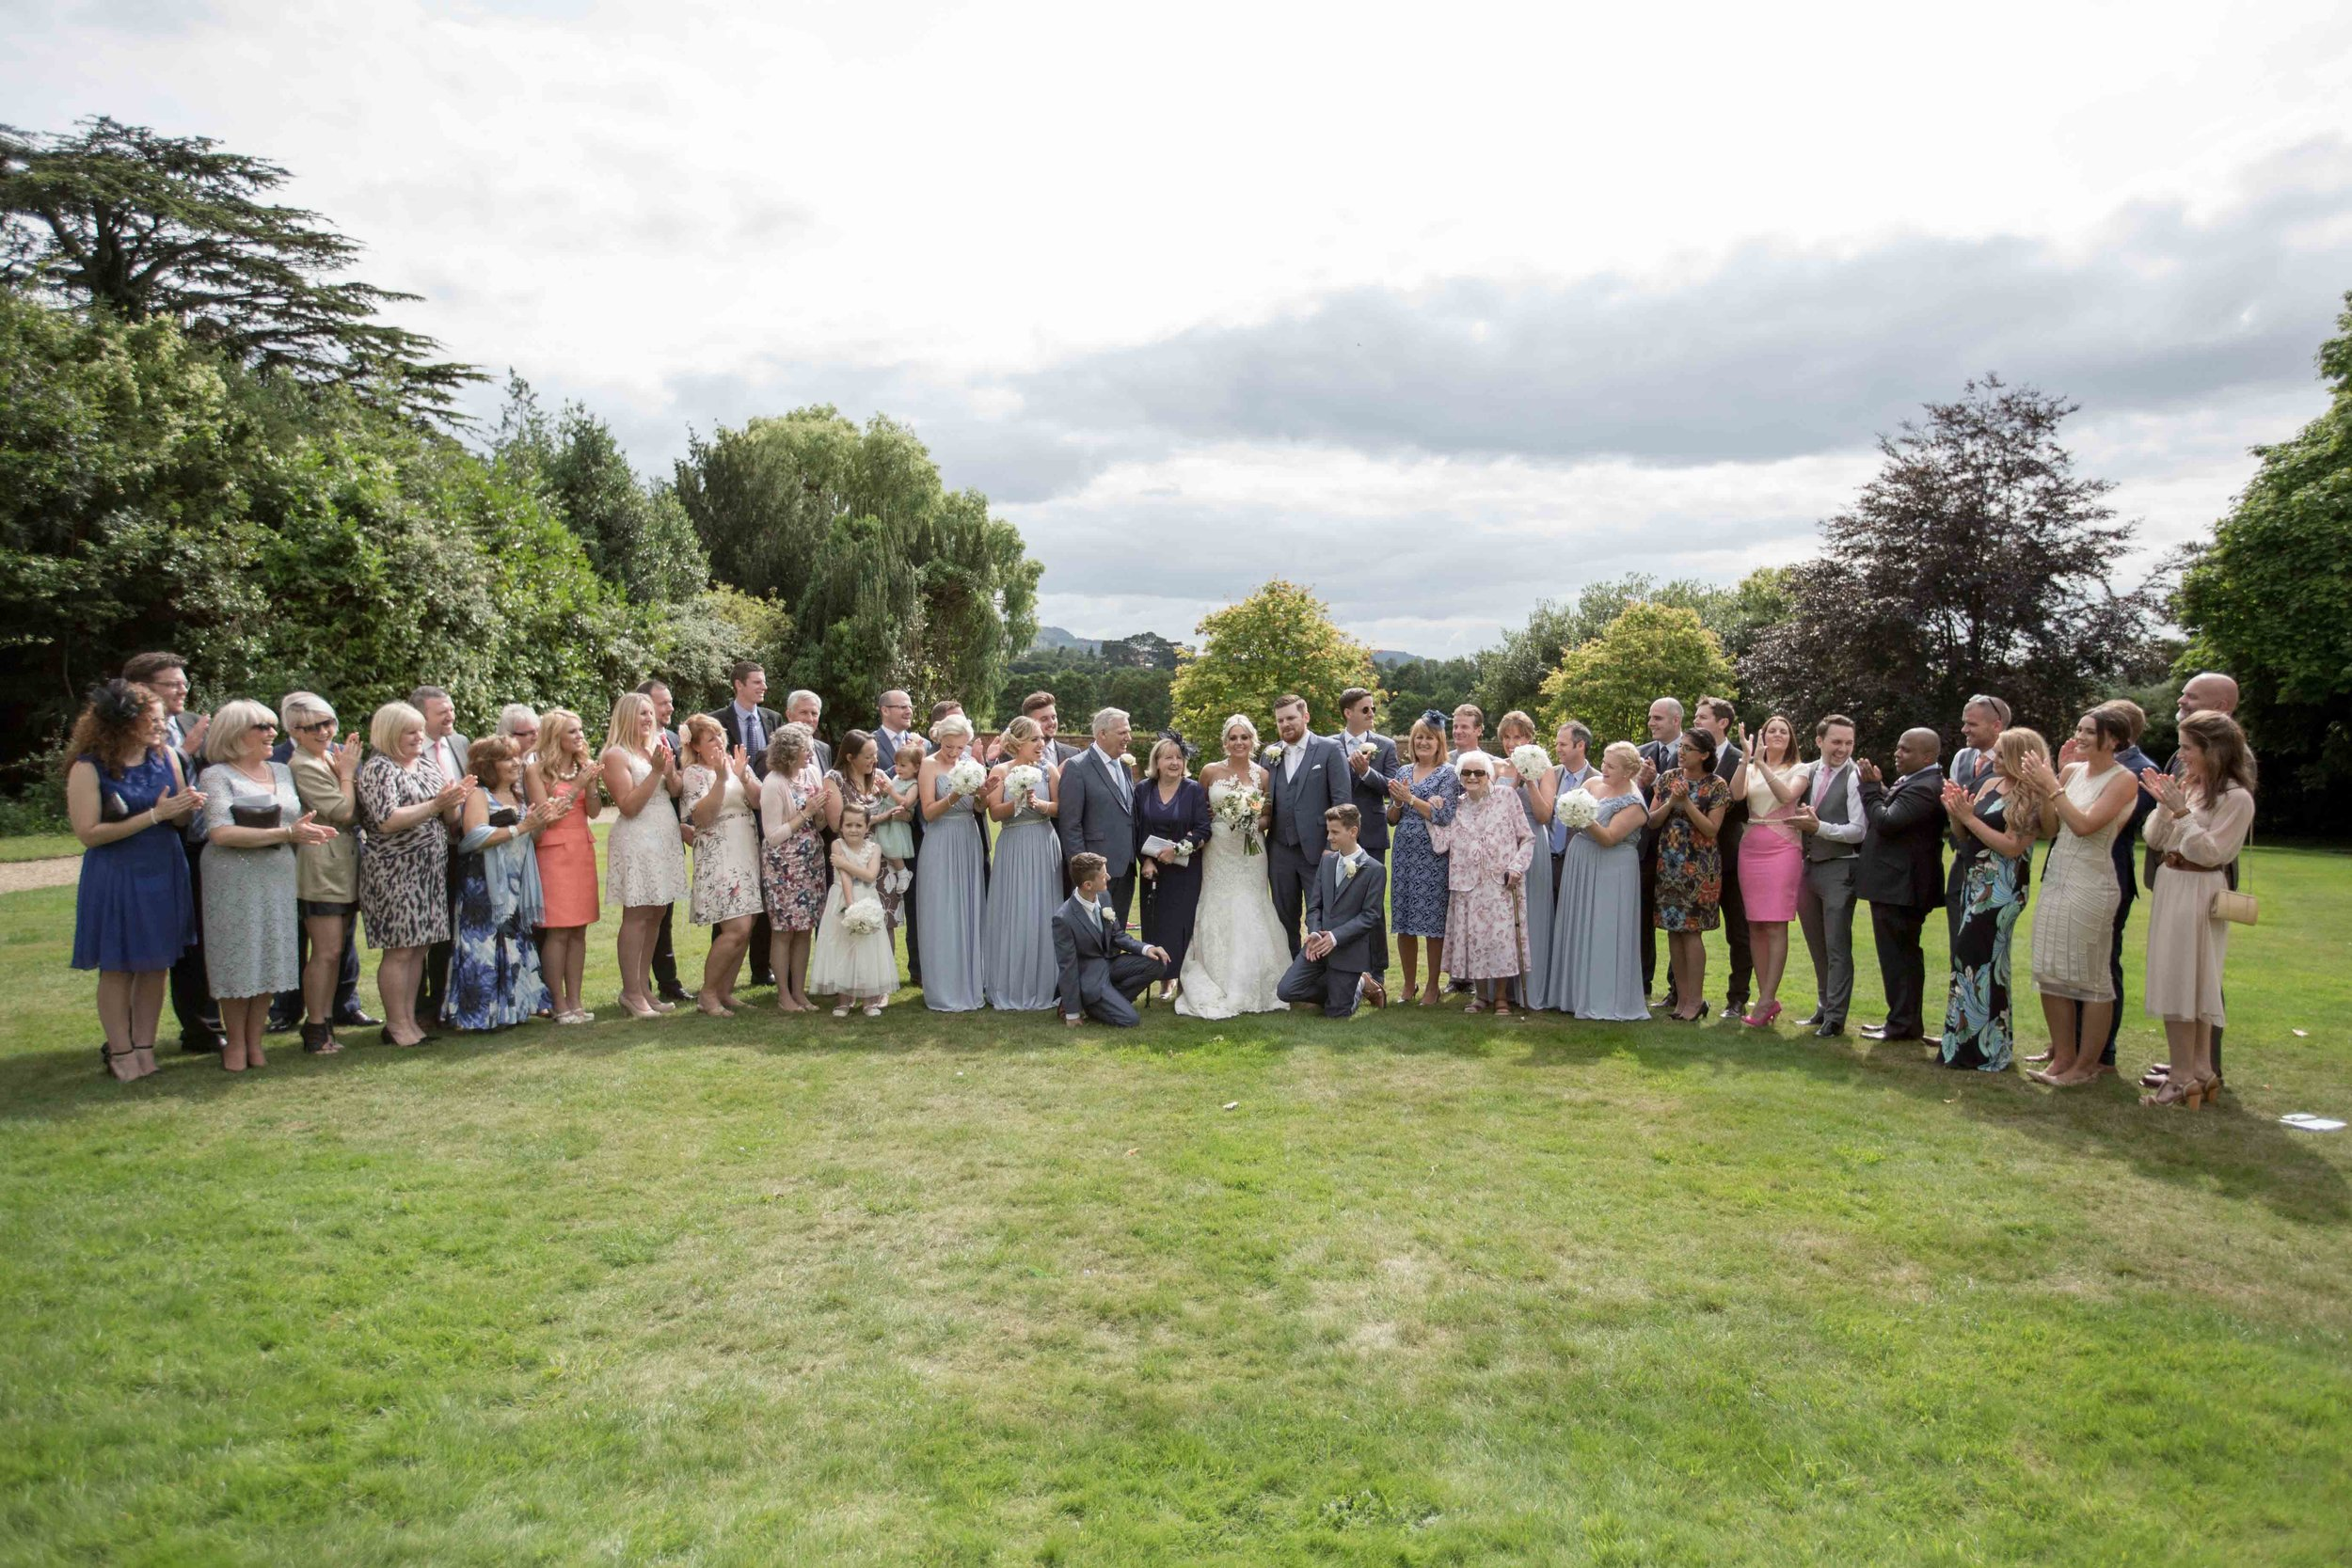 cotswold-wedding-photography-at-stonehouse-court-hotel-natalia-smith-photography-gloucestershire-wedding-photographer-49.jpg